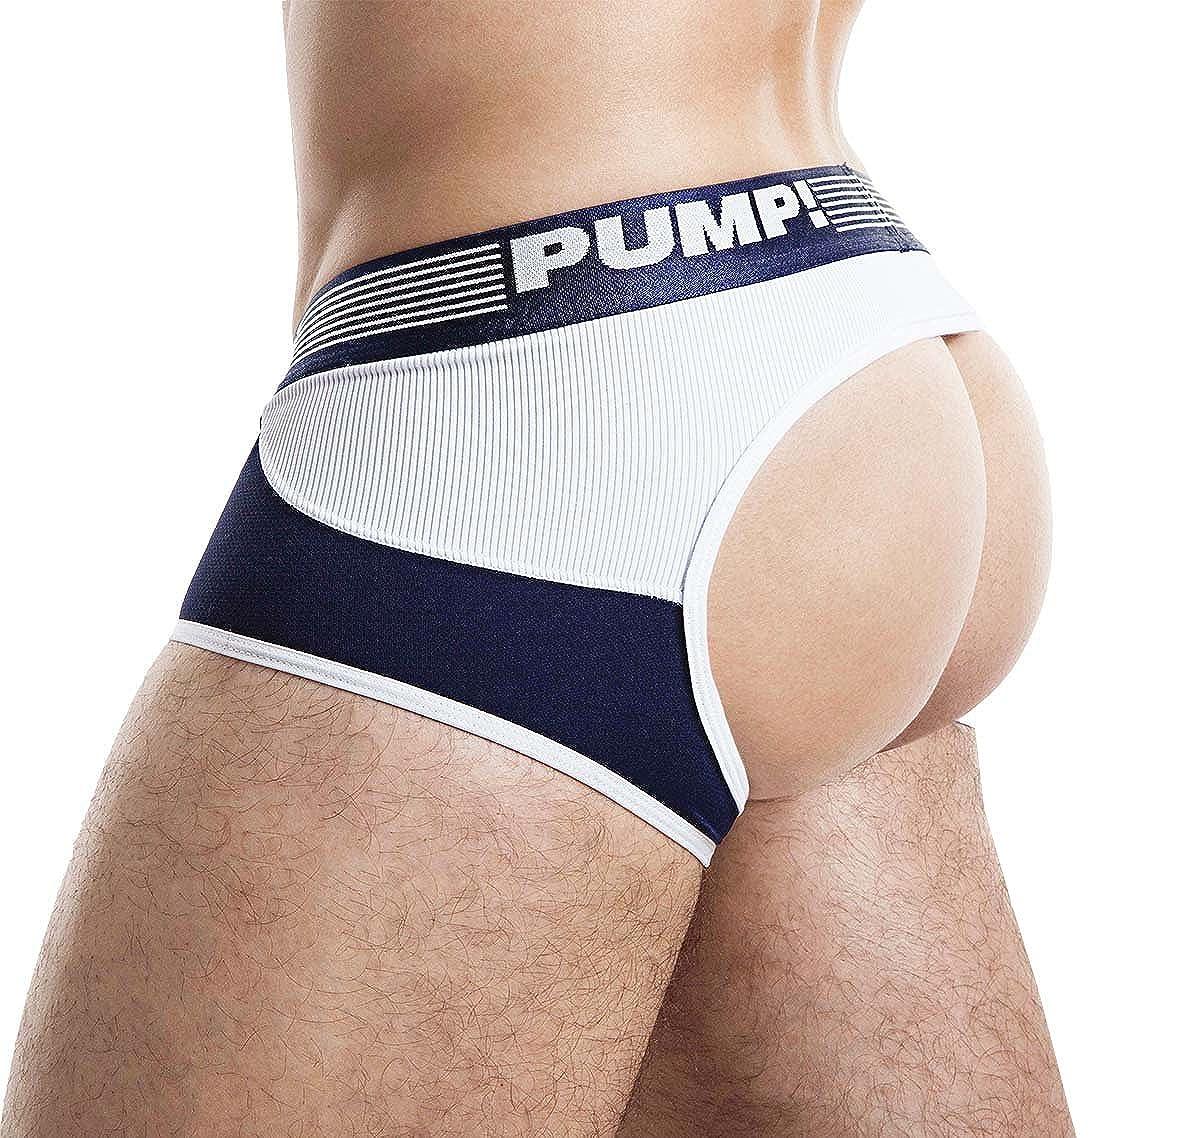 Navy PUMP Jockstrap Access Trunk 15031